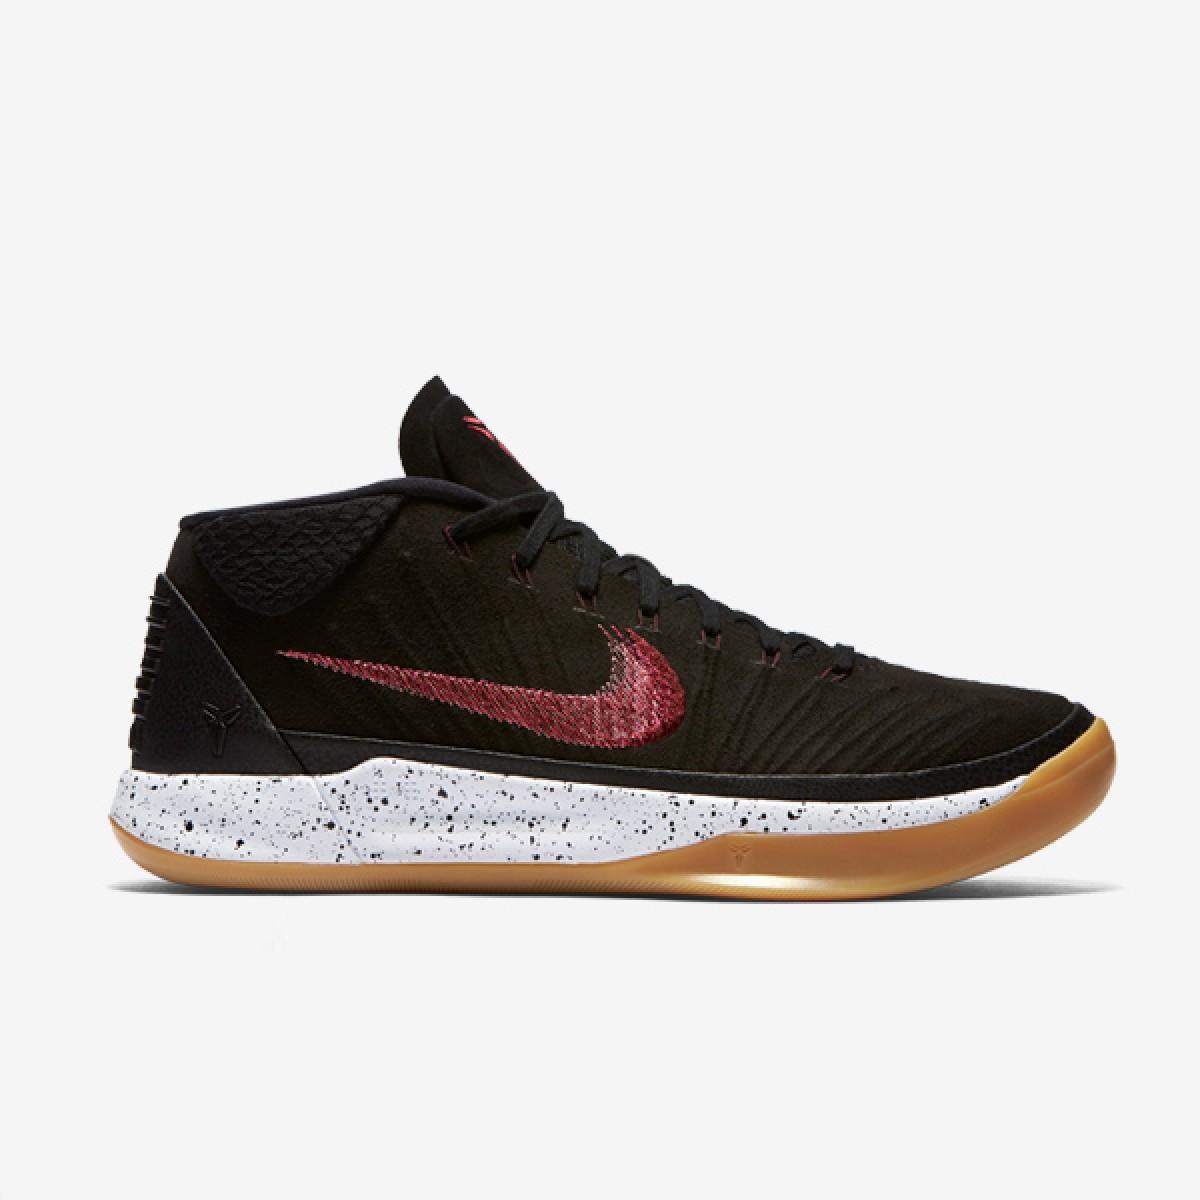 Nike Kobe AD Mid 'Black Gum'